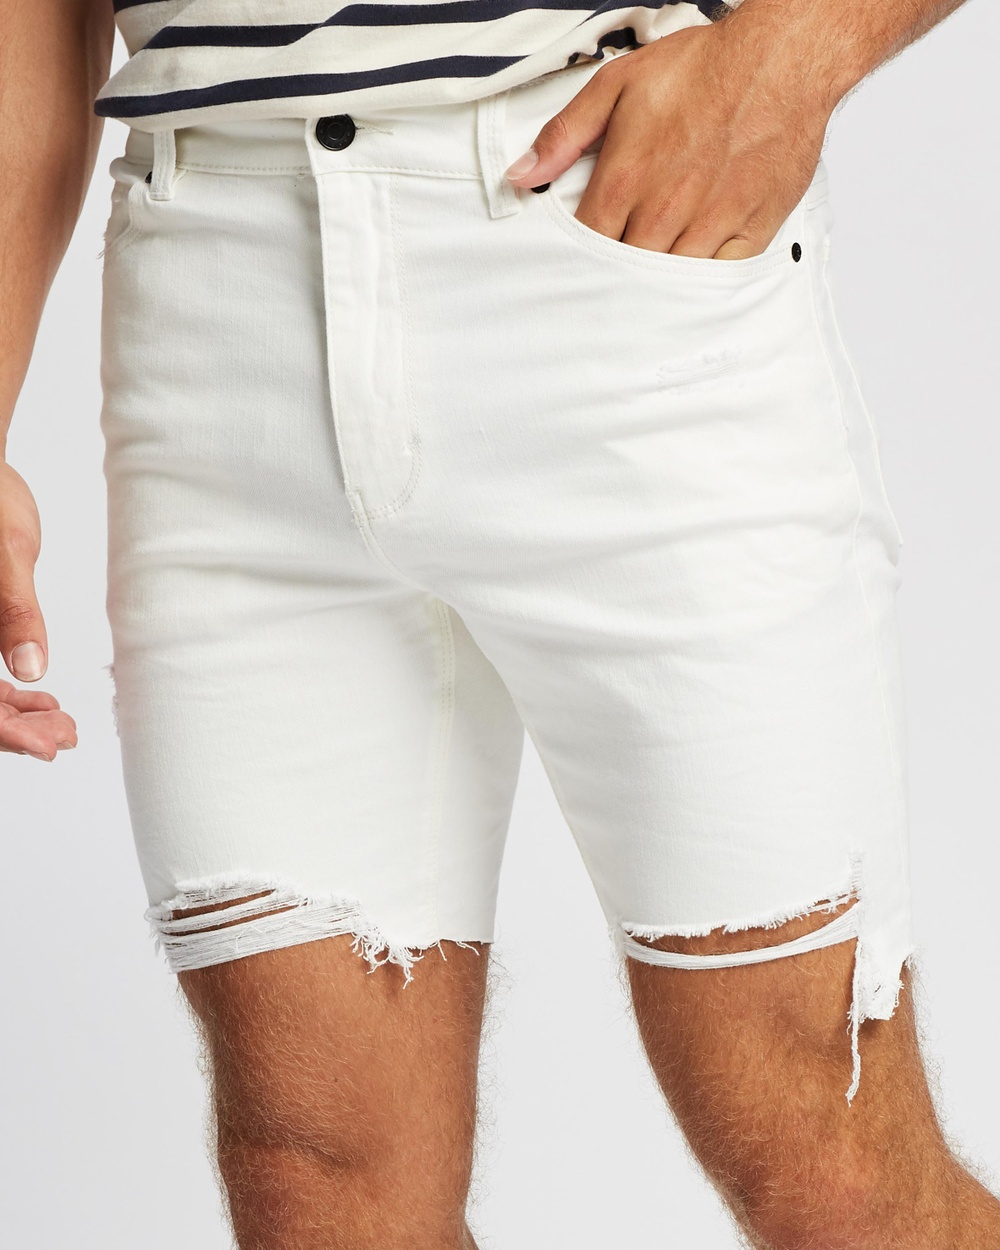 Abrand A Dropped Skinny Shorts Denim White Heat